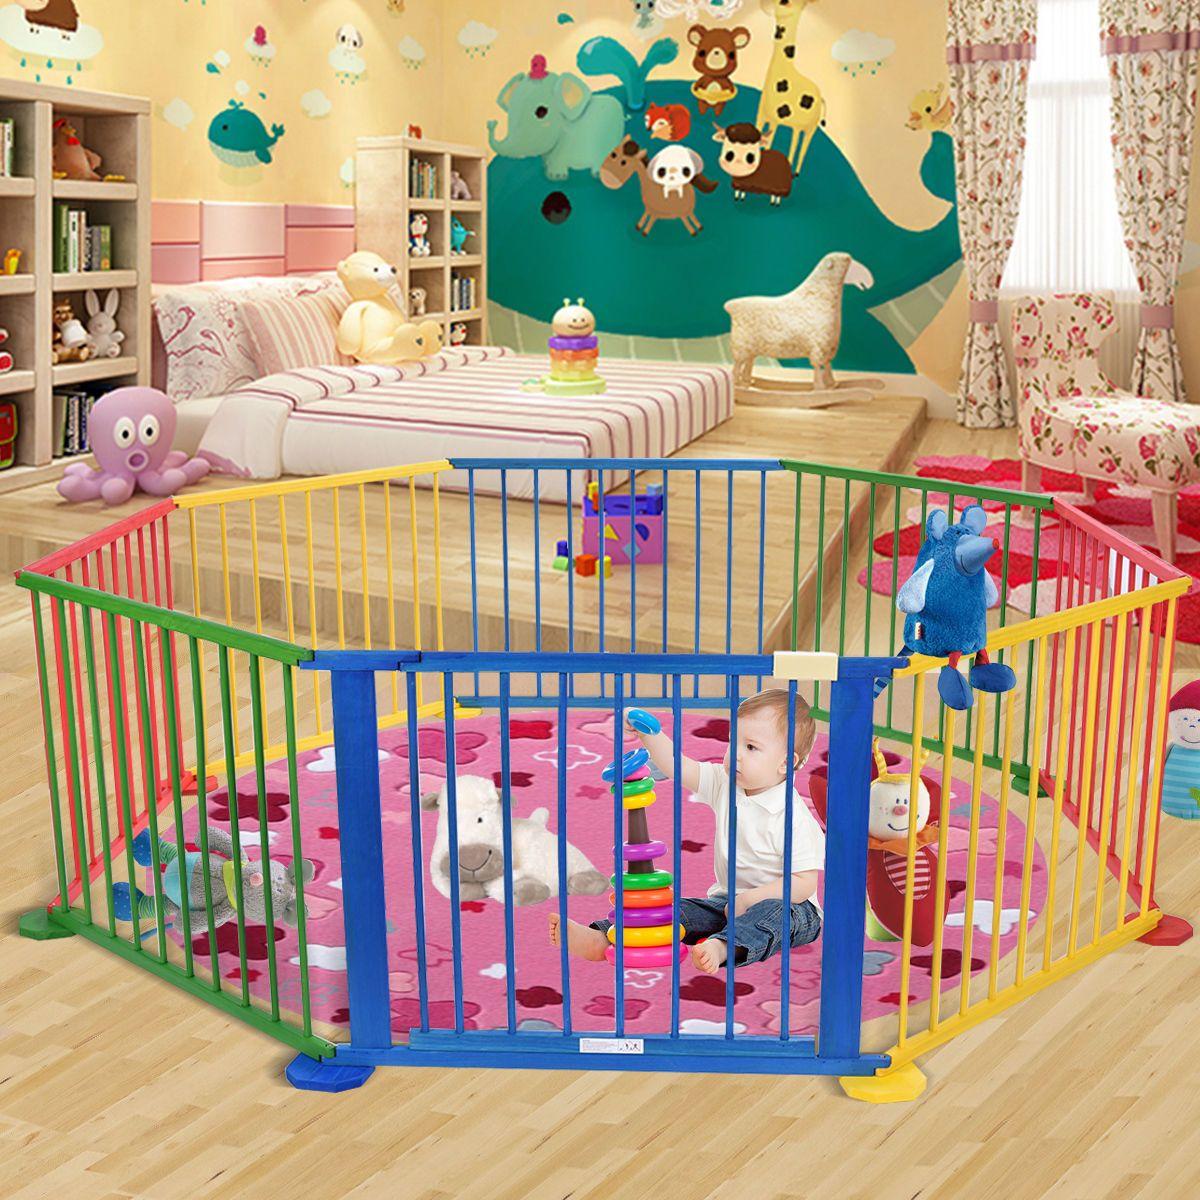 baby playpen 8 panel colors wooden frame children playard foldable room divider